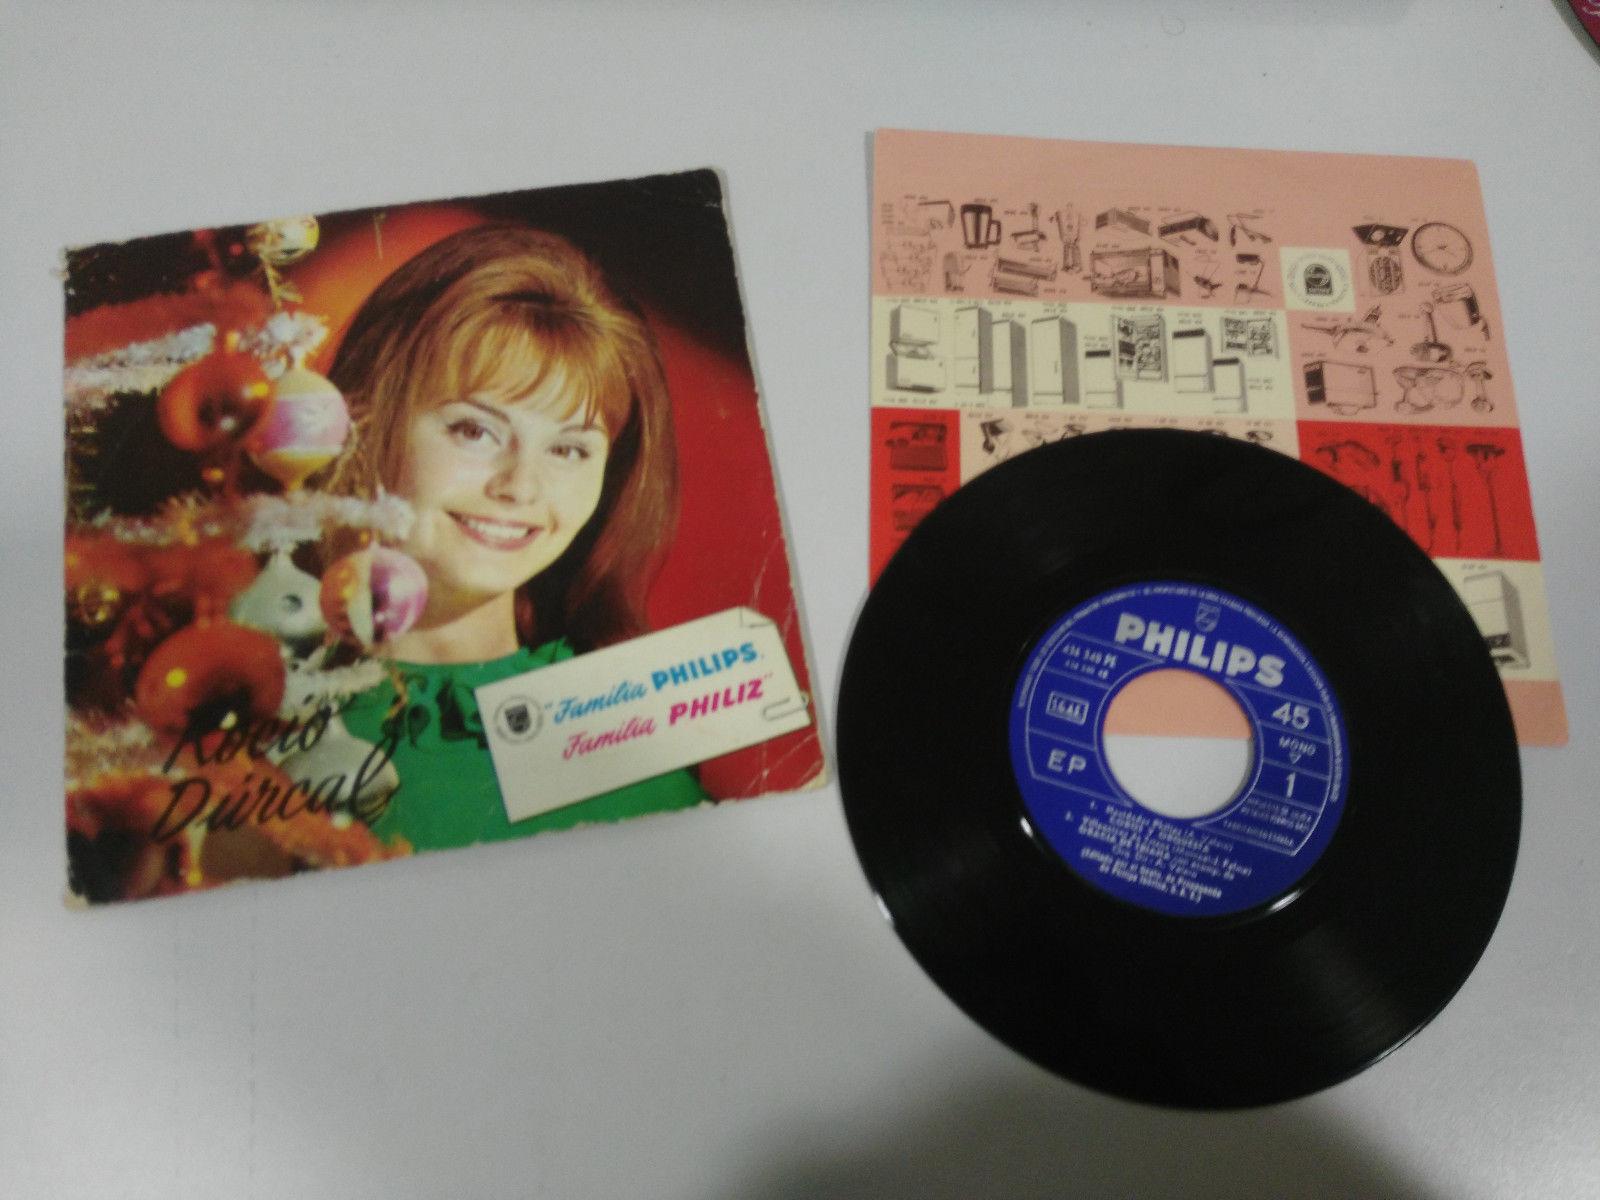 Como buena estrella de finales del siglo pasado, Rocío Dúrcal cantaba a estas fechas tan entrañables. Foto: Ebay.